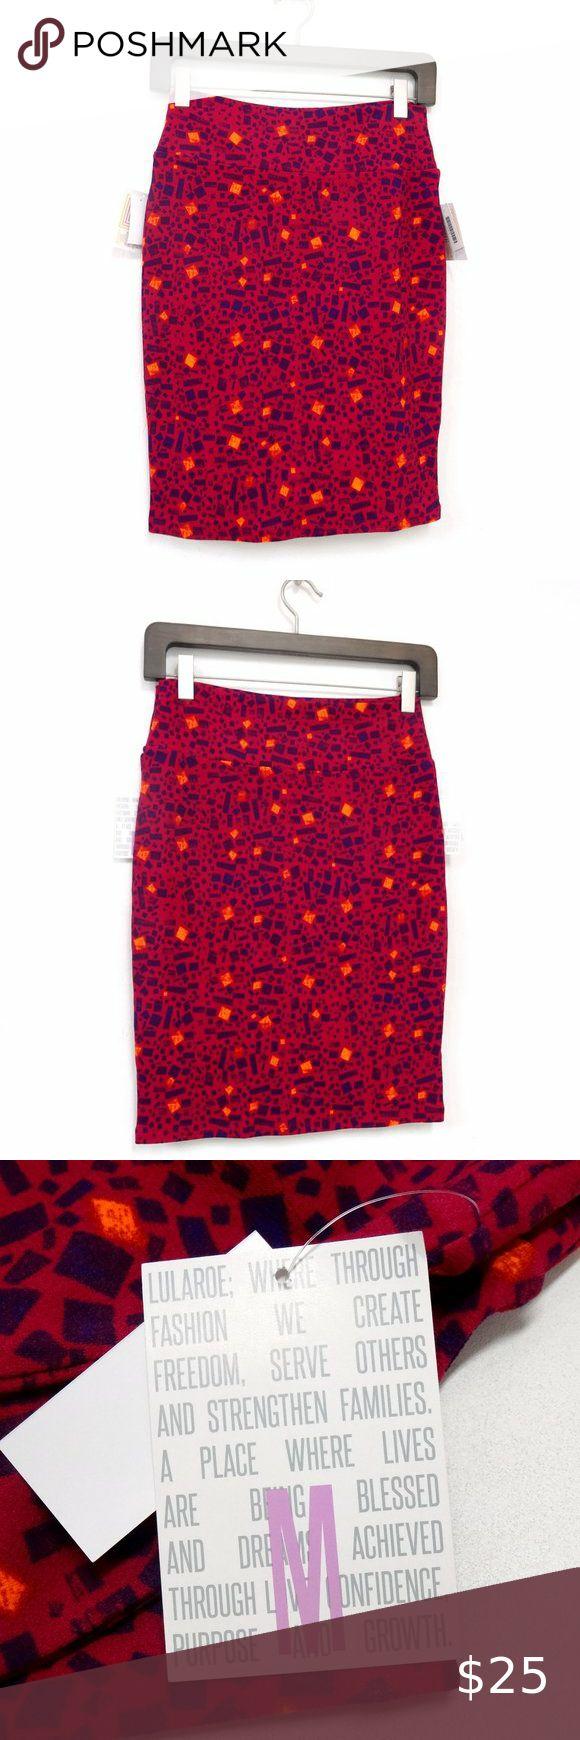 Lularoe Cassie Knee-High Pencil Skirt in 2020 | Lularoe ...